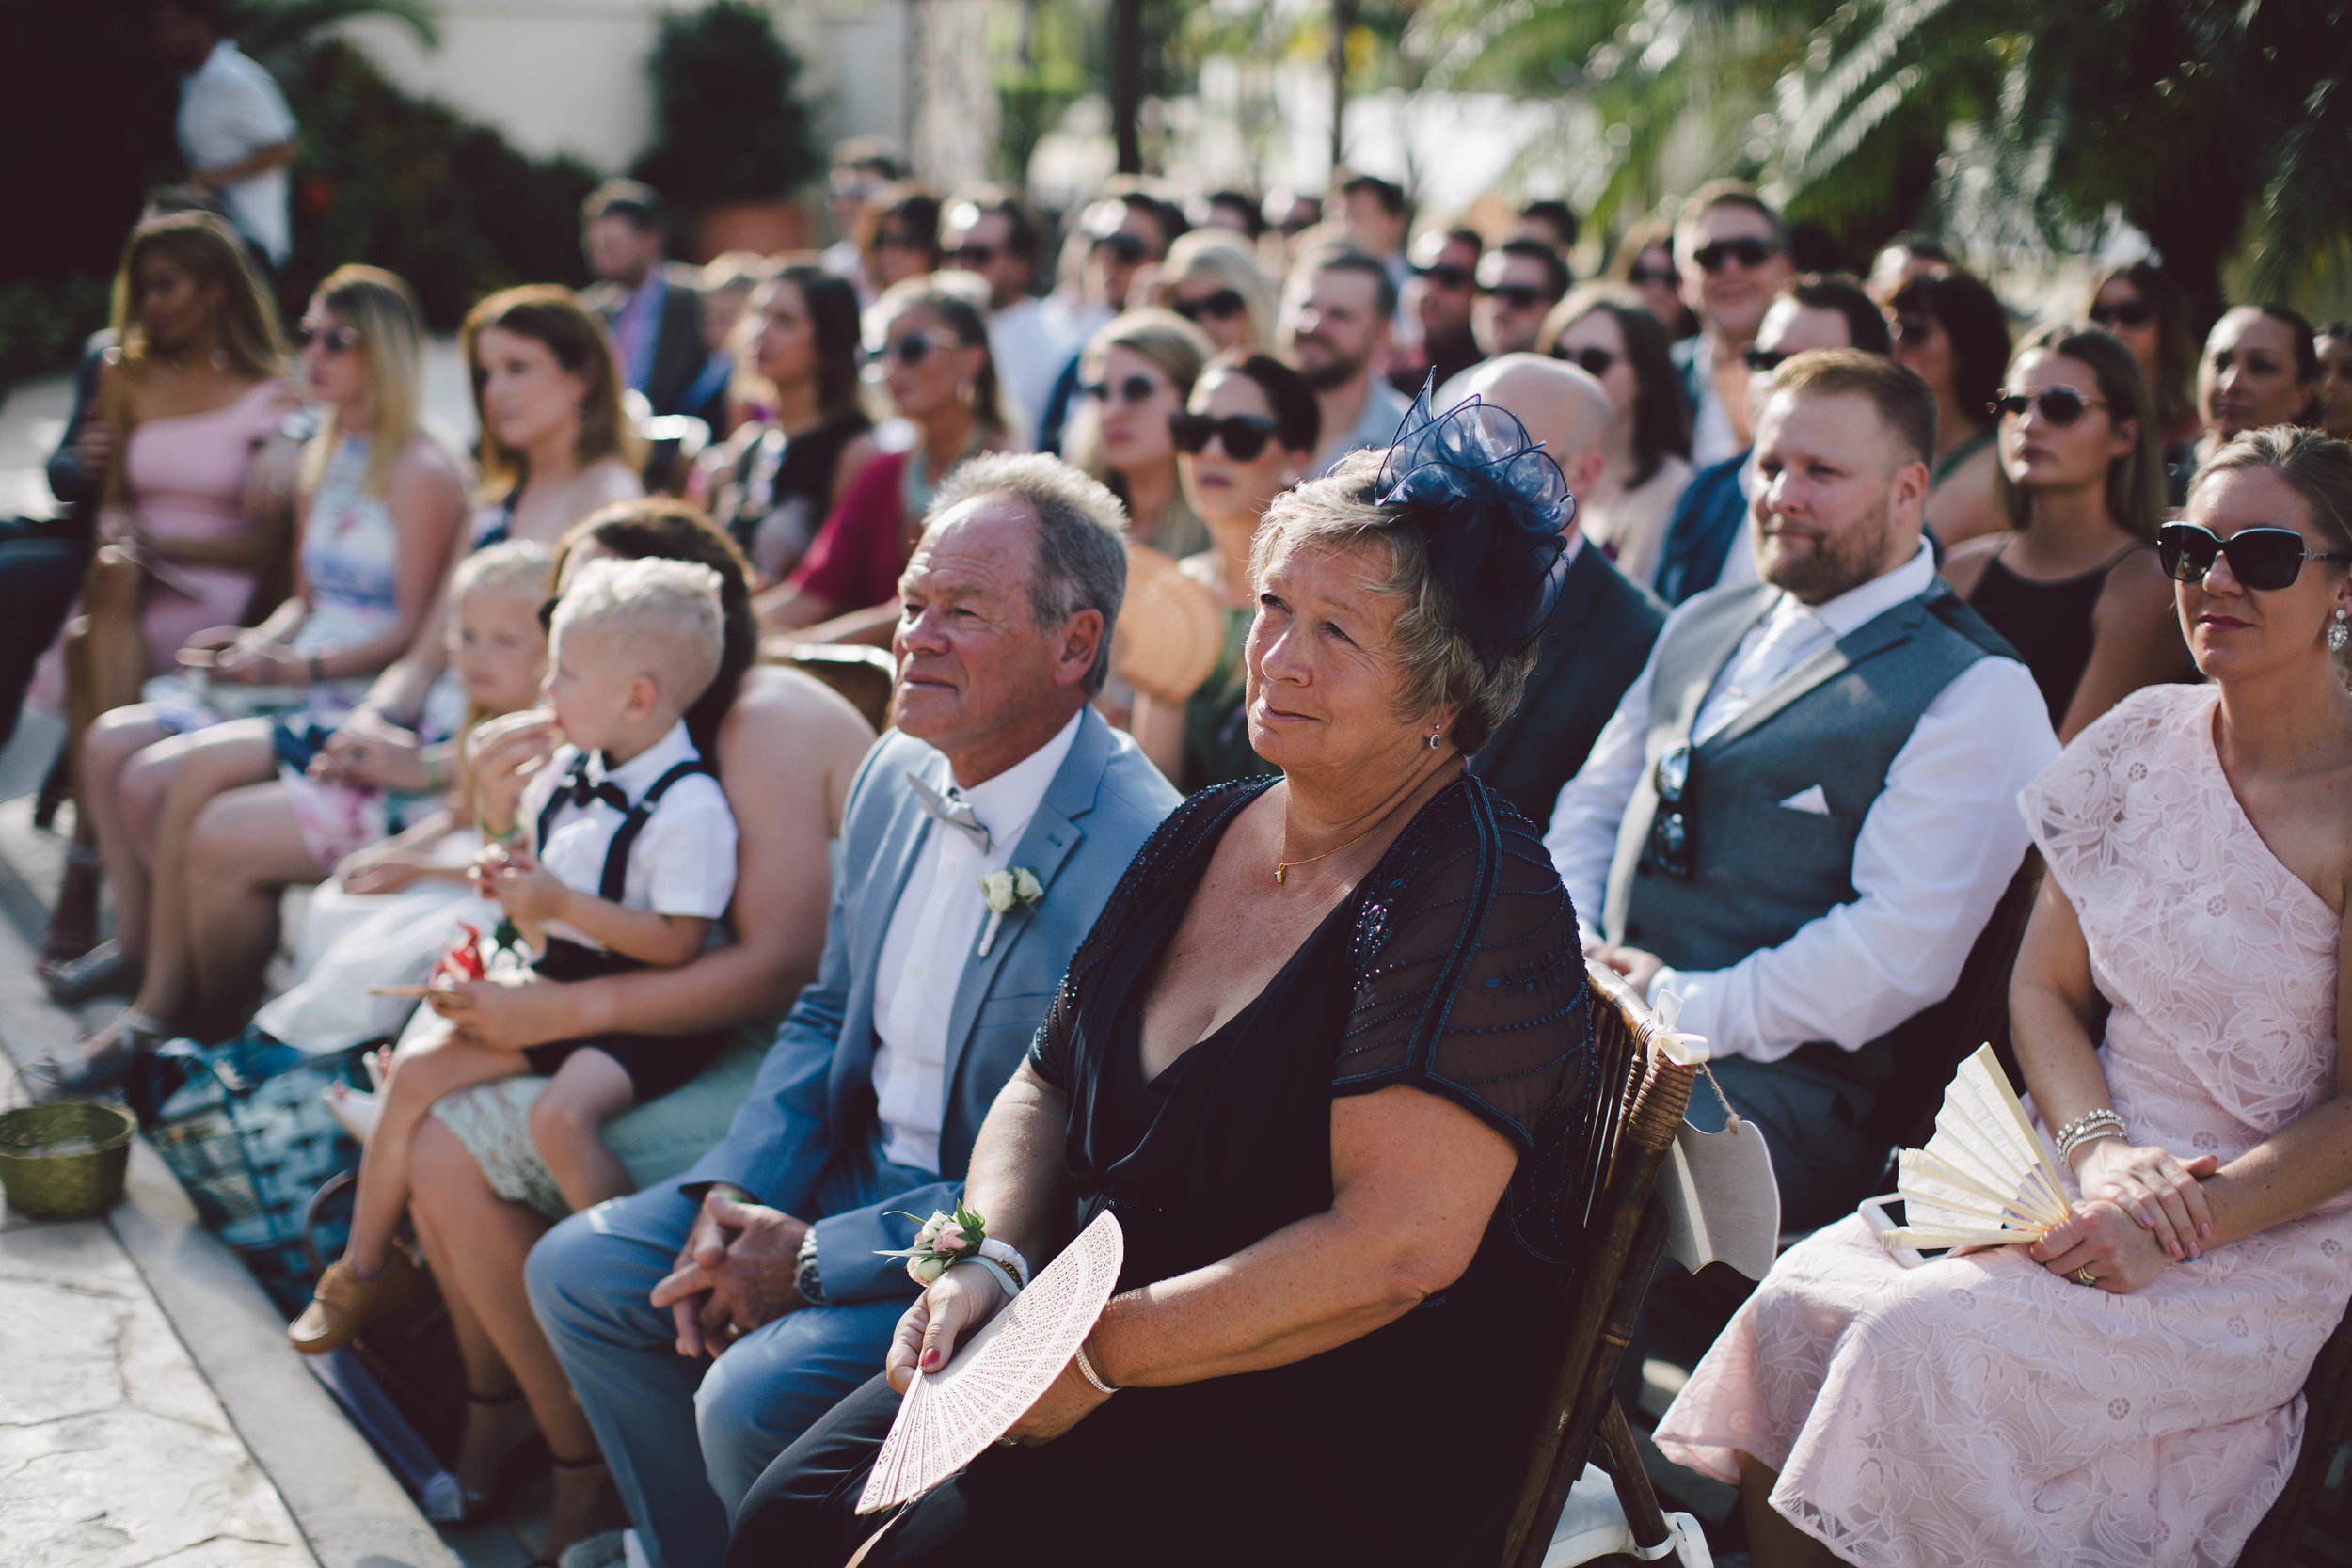 mexico_wedding_cancun_villa_la_joya_evangeline_lane_049.jpg